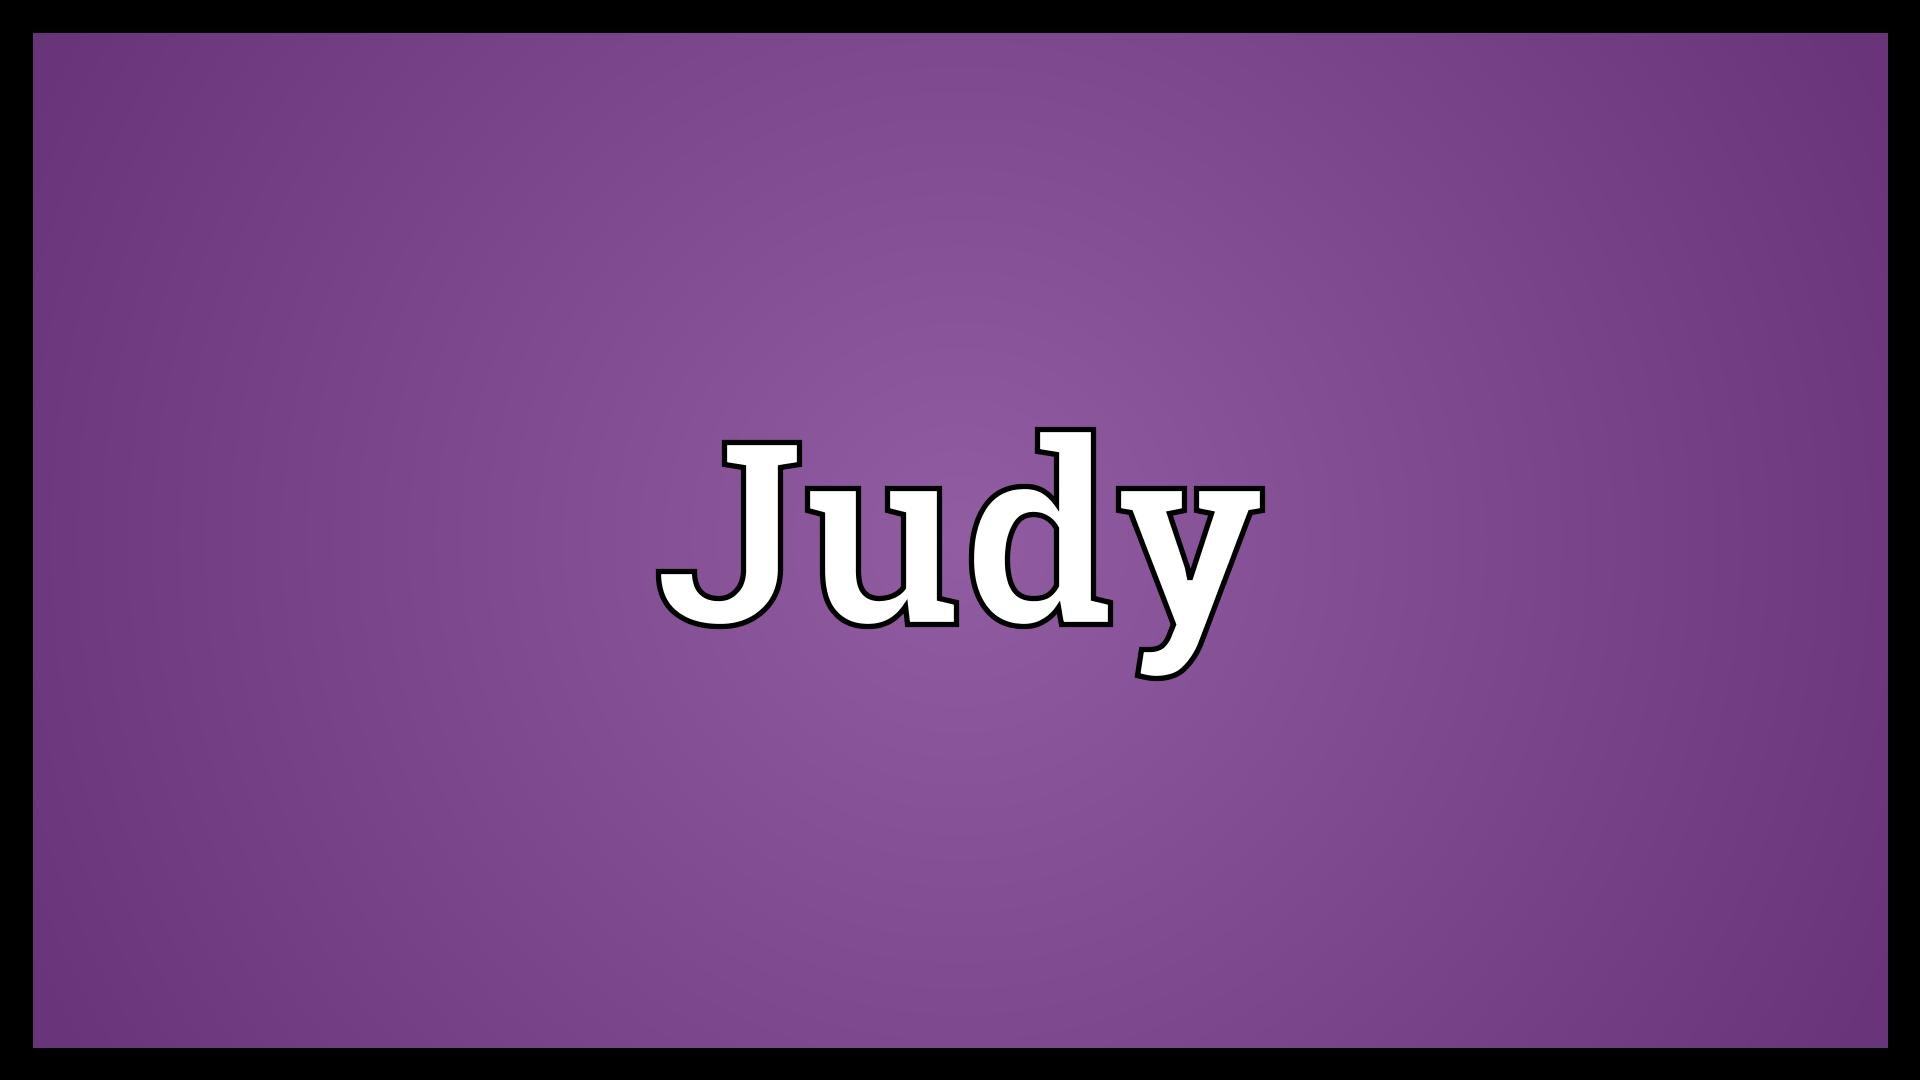 بالصور معنى اسم جودي , صفات من يحملن اسم جودى 1553